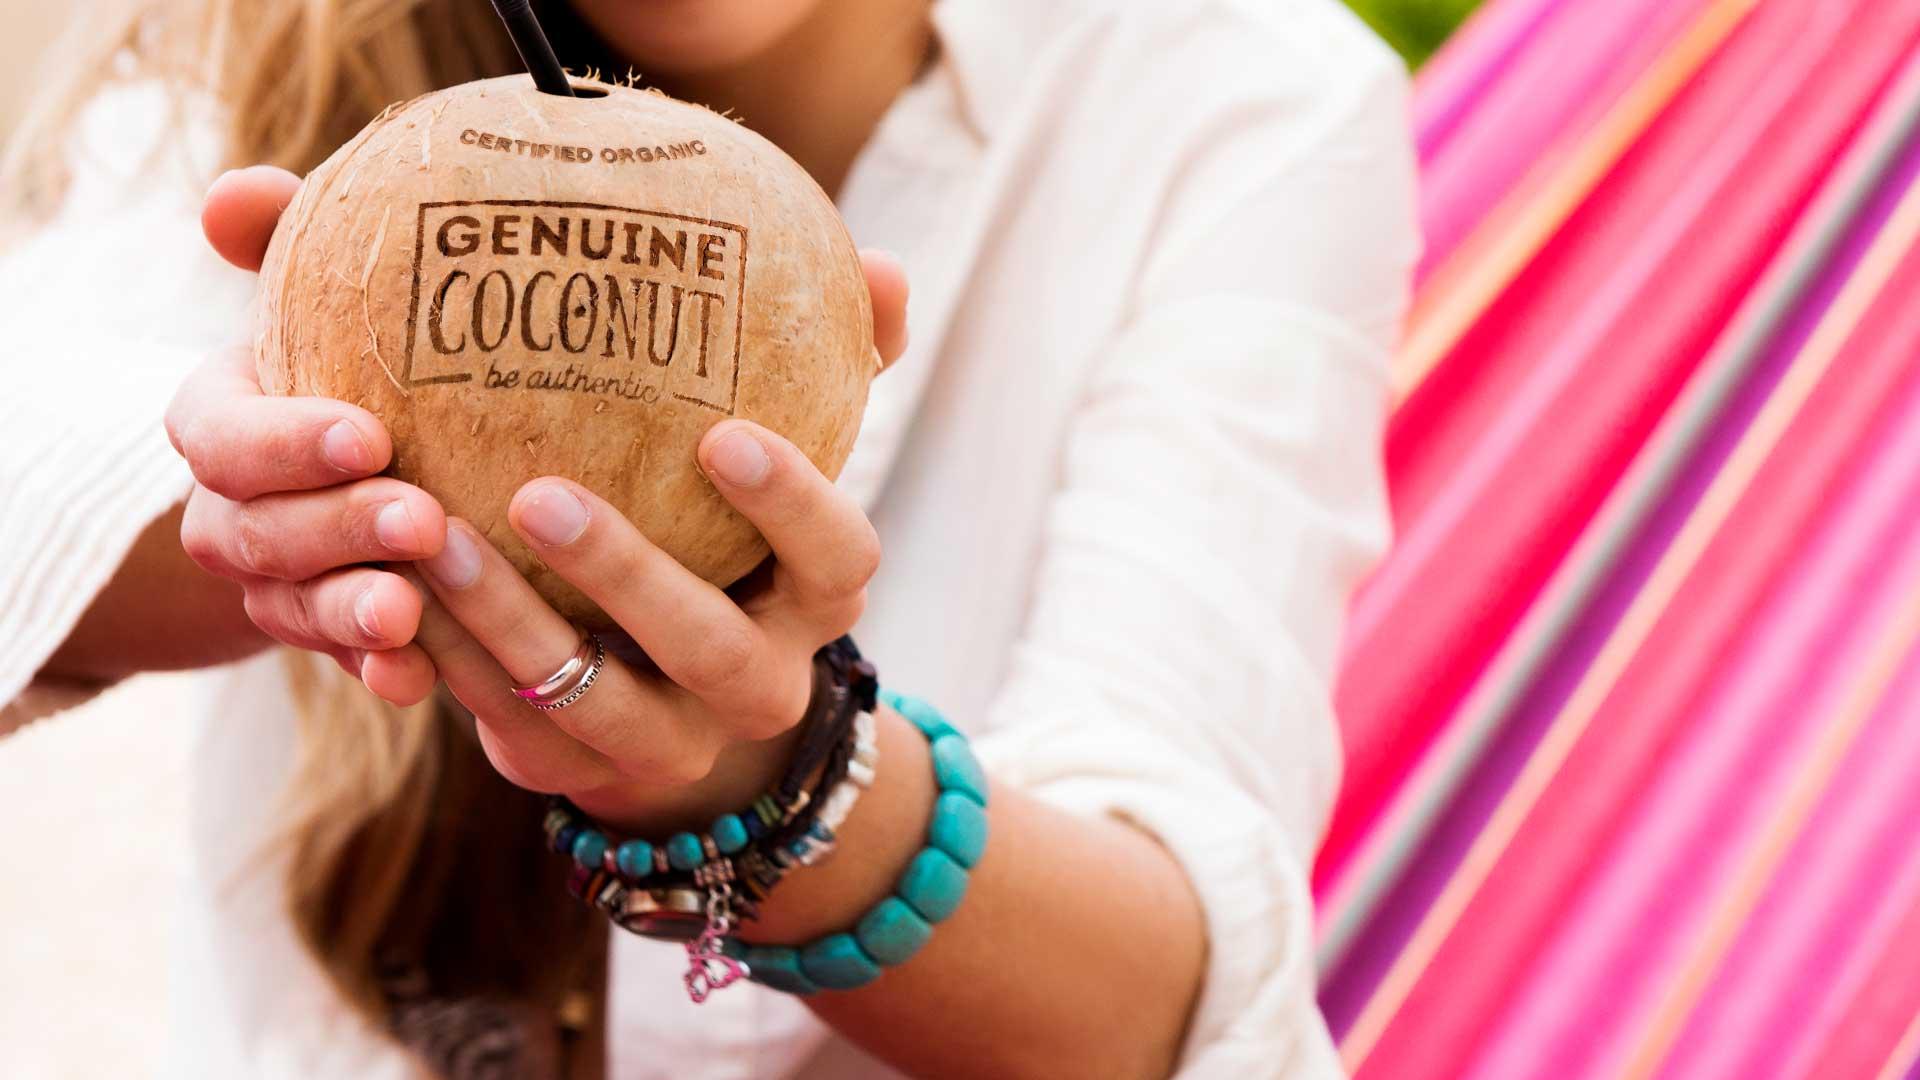 agua-de-coco-genuine-coconut-salud-energia